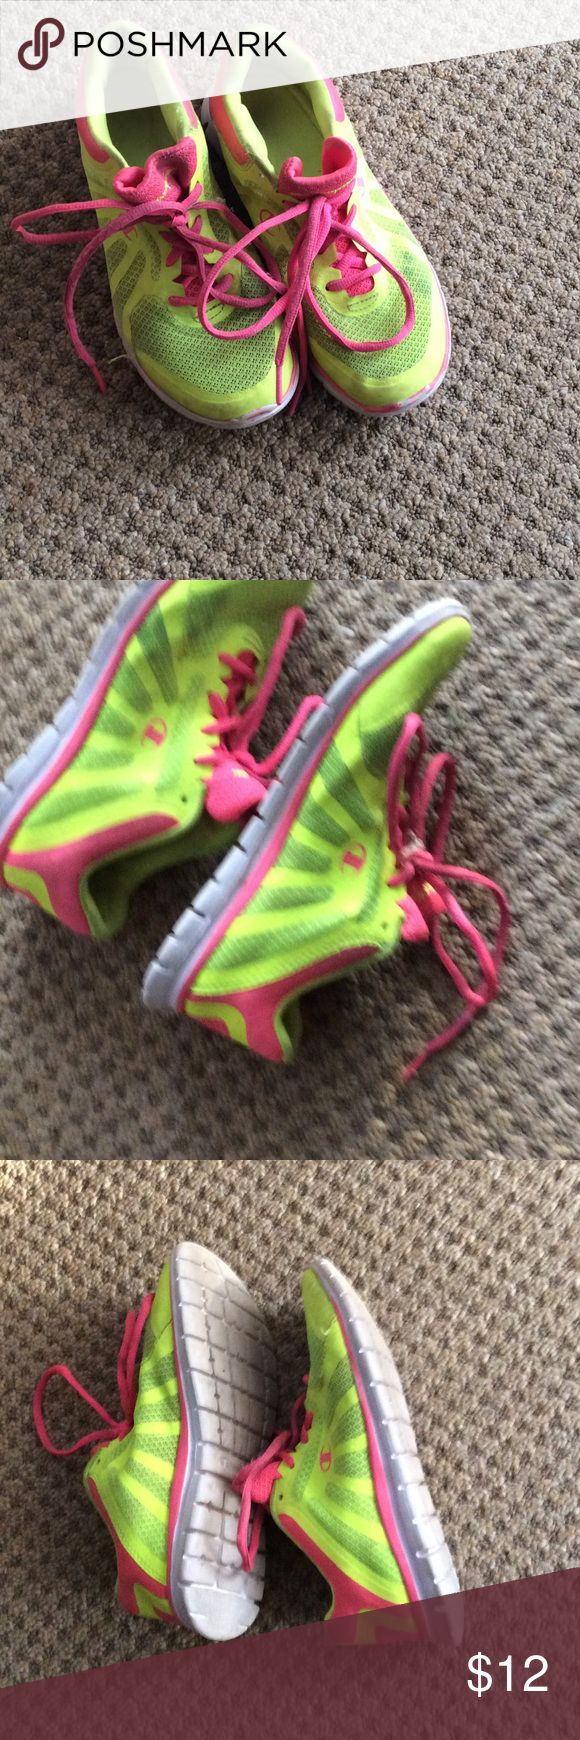 Girls tennis shoes size 3 Champion girls tennis shoes size 3. Used great condition.. Champion Shoes Sneakers